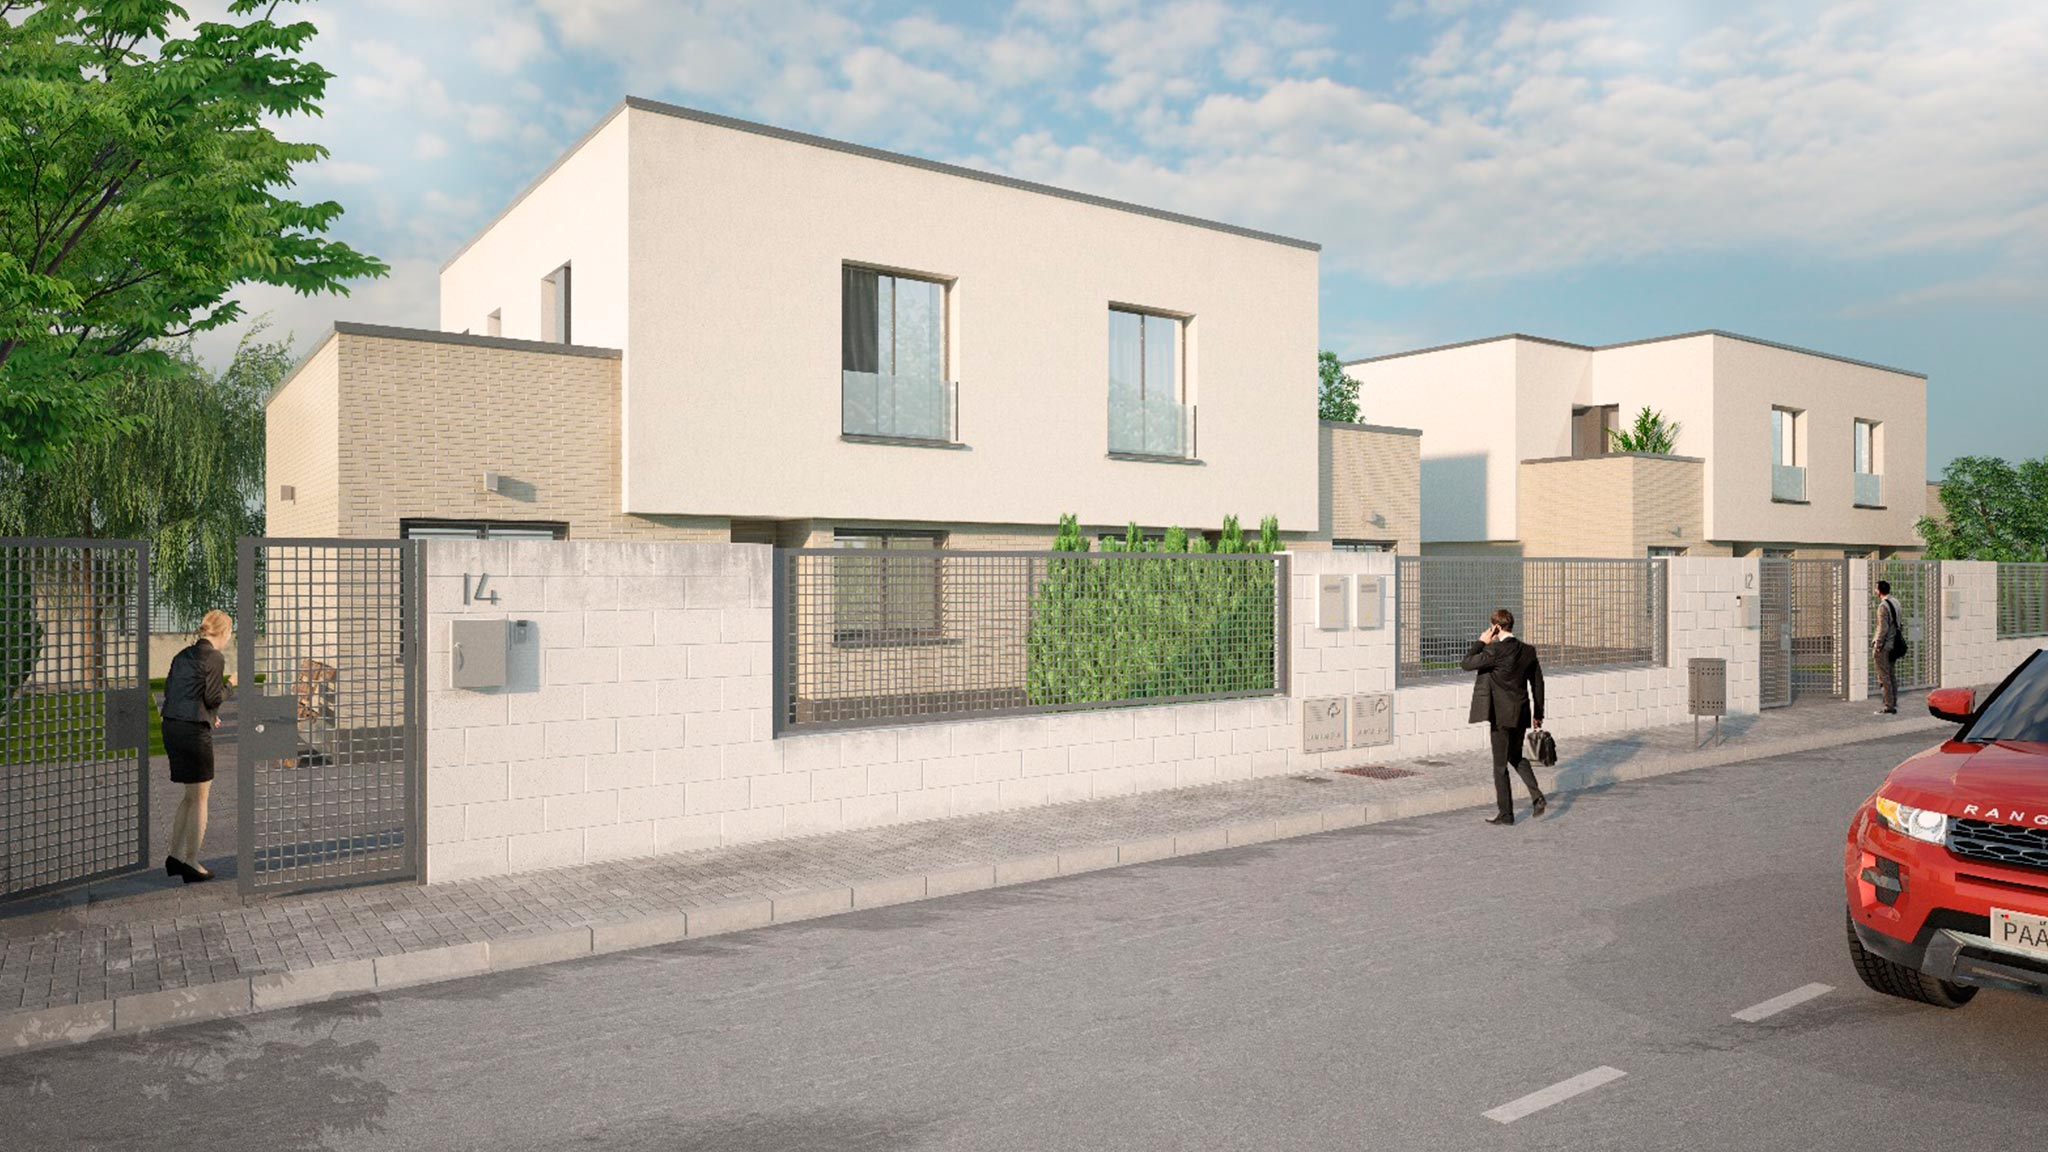 Comprar casa en villanueva del ariscal min constructora - Constructoras en sevilla ...